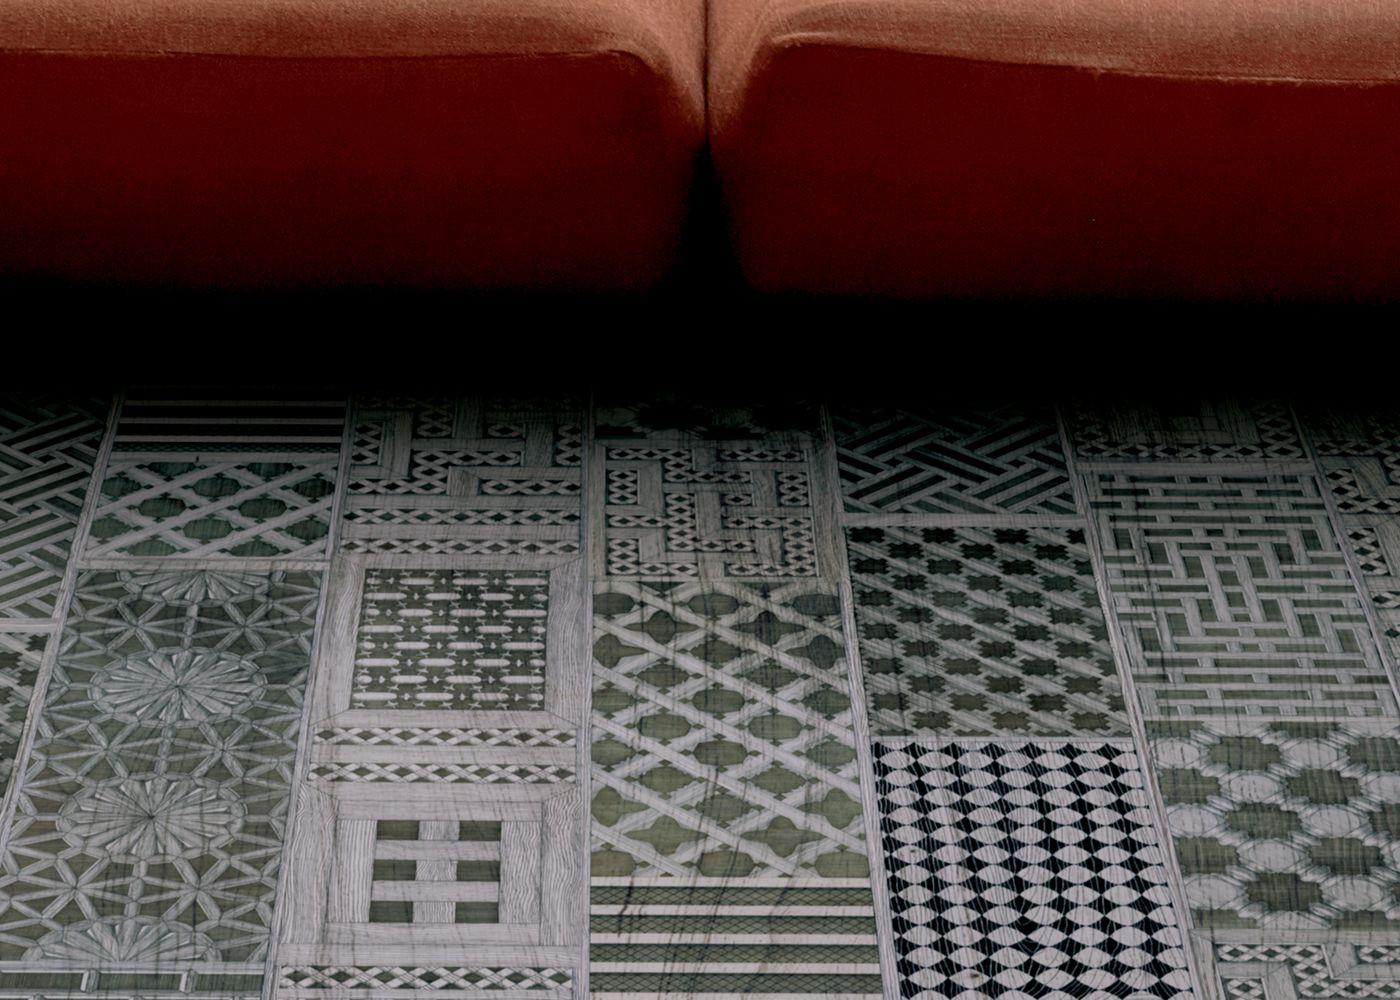 Parquet Contrecollé Monolame Chêne G4 Prbis Contemporain Vernis Brossé Mat Teinte Blanche (sw)- Design Musciarabia 2 (piero Fornasetti )- Pefc - Fsc